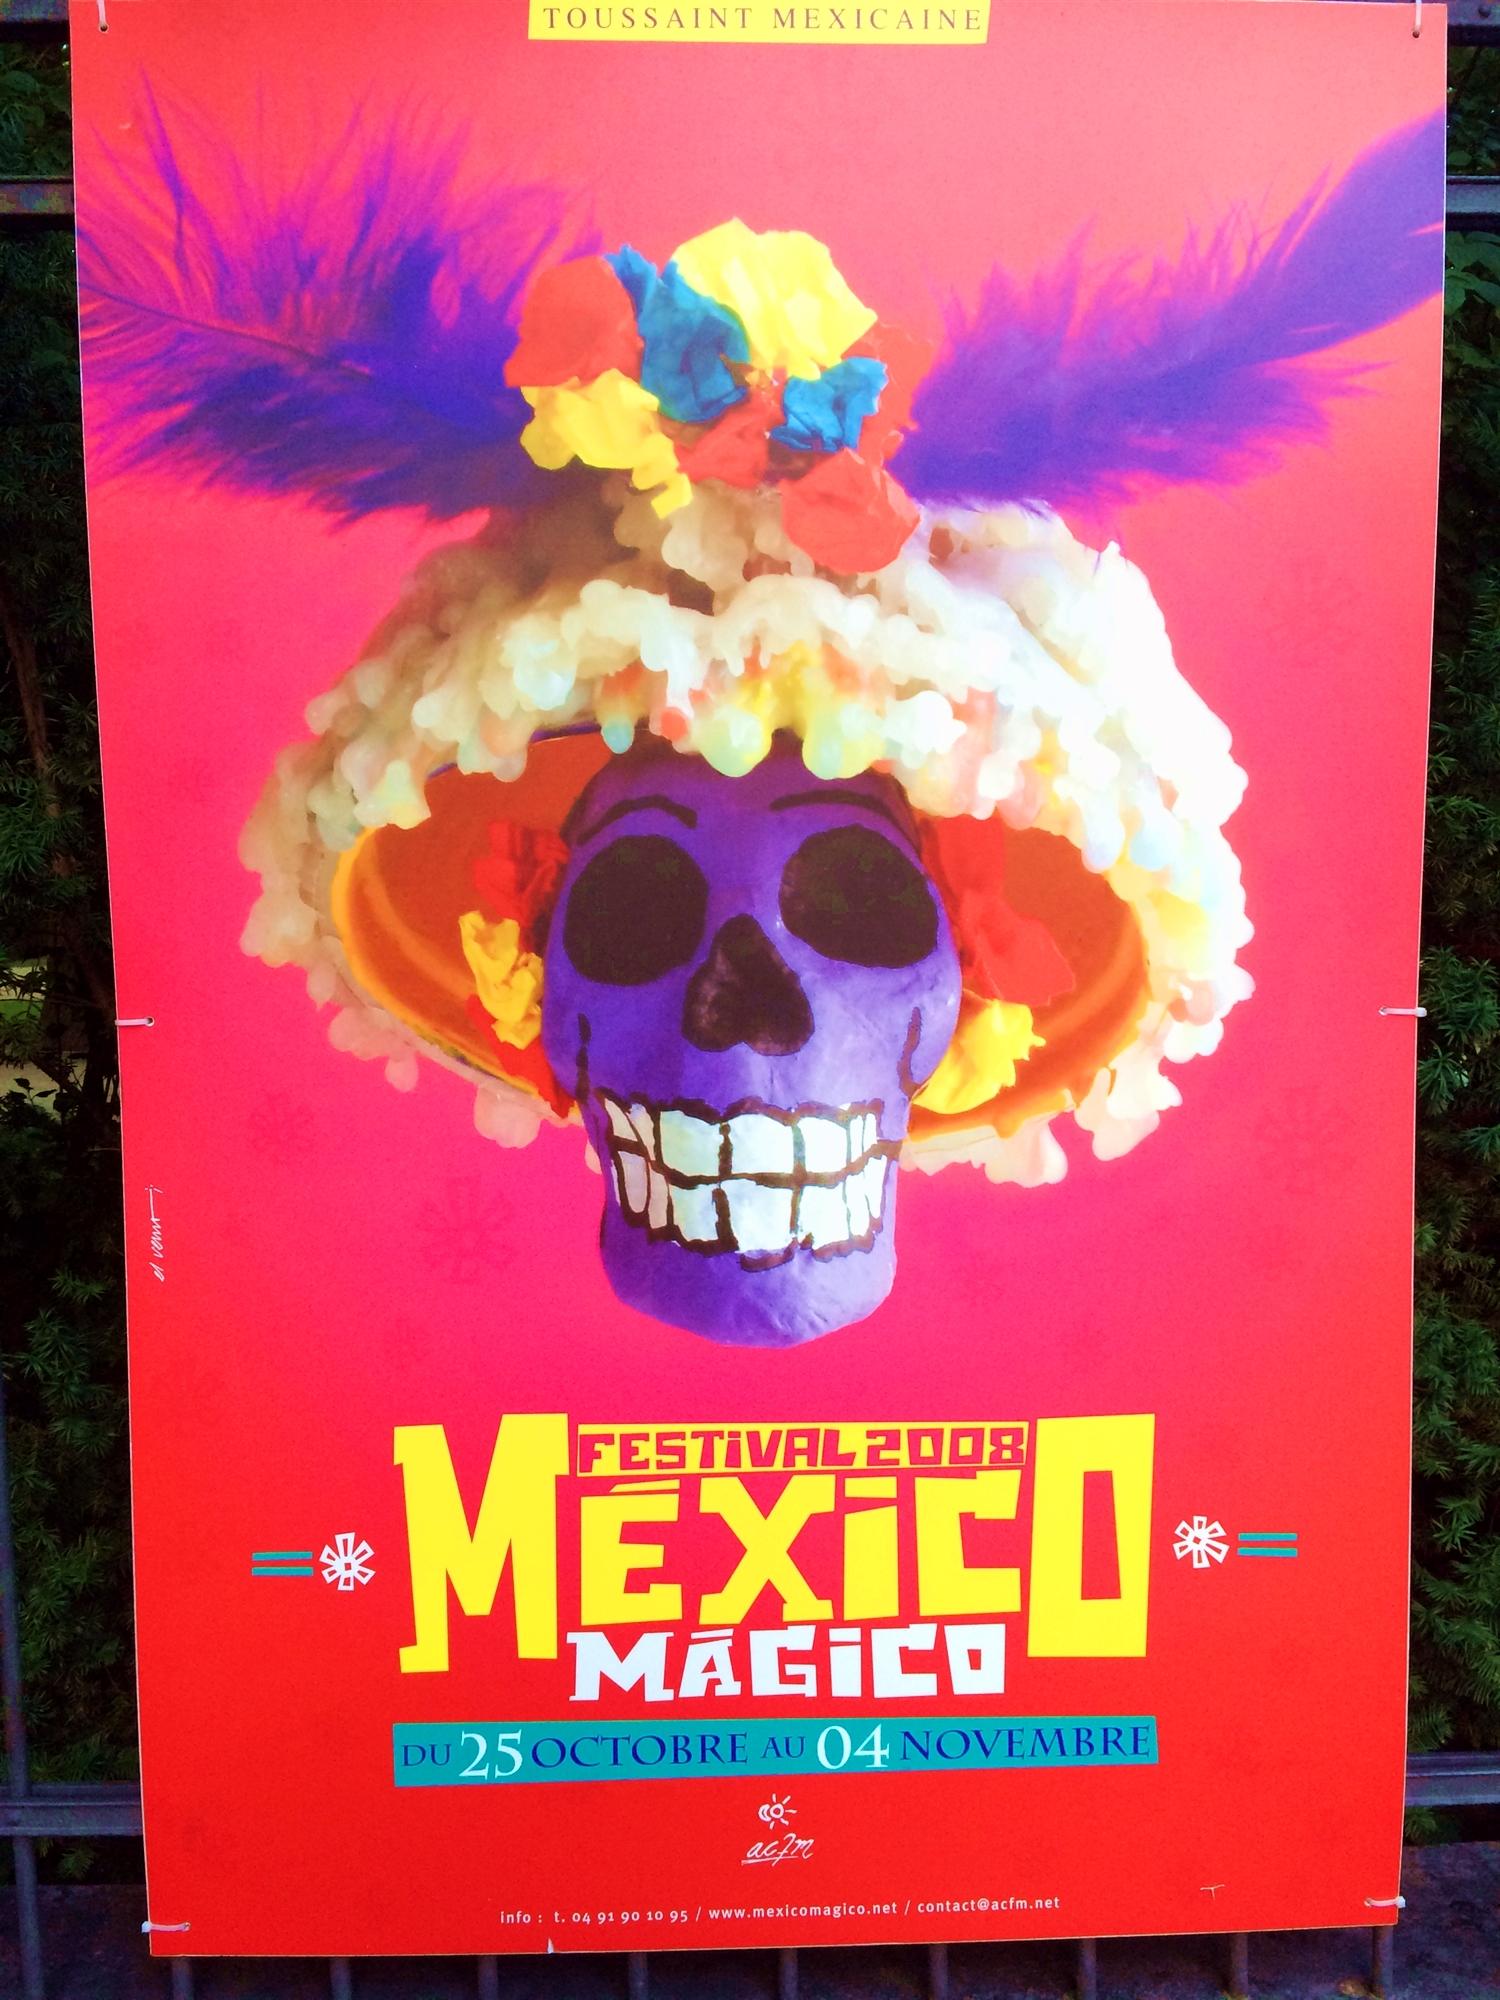 11 Mexican poster street art design plakat meksykanski projektowanie uzytkowe sztuka uliczna FORelementspl